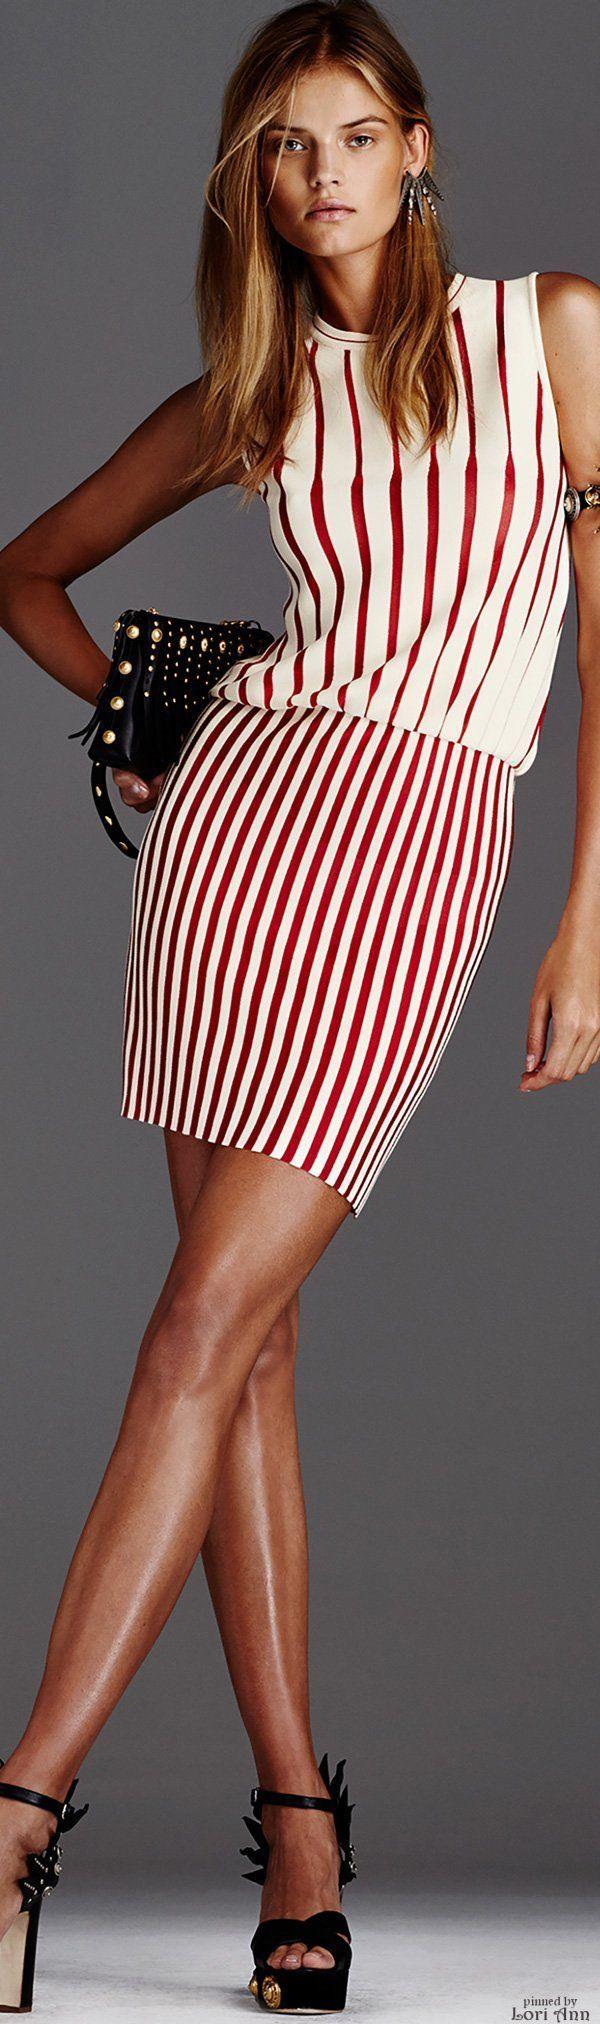 Fausto Puglisi Resort 16: white & red striped dress, black studded bag & sandals.